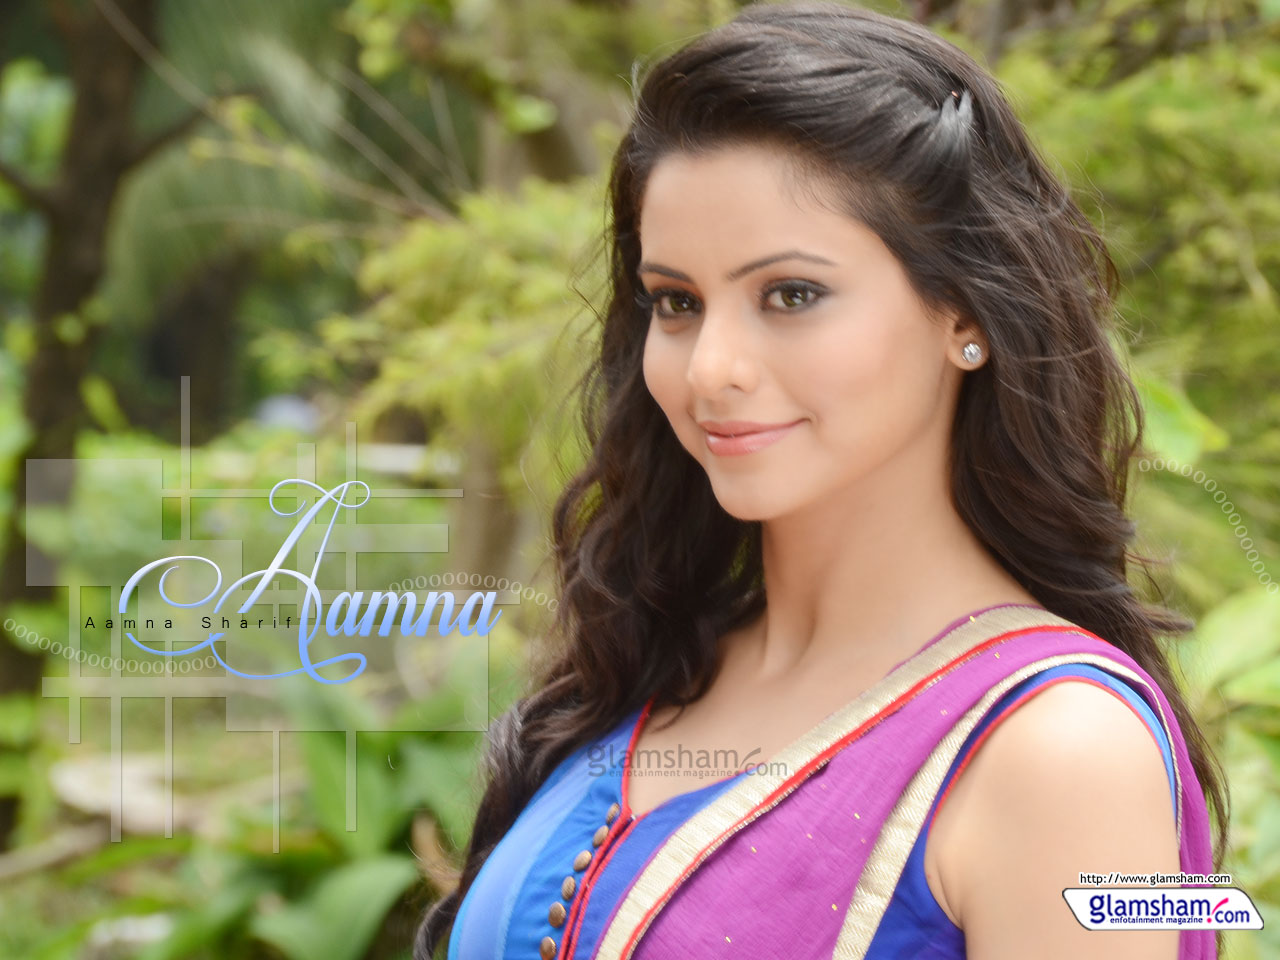 Prachi Desai Hd Wallpaper Hd Wallpapers Hot Aamna Sharif